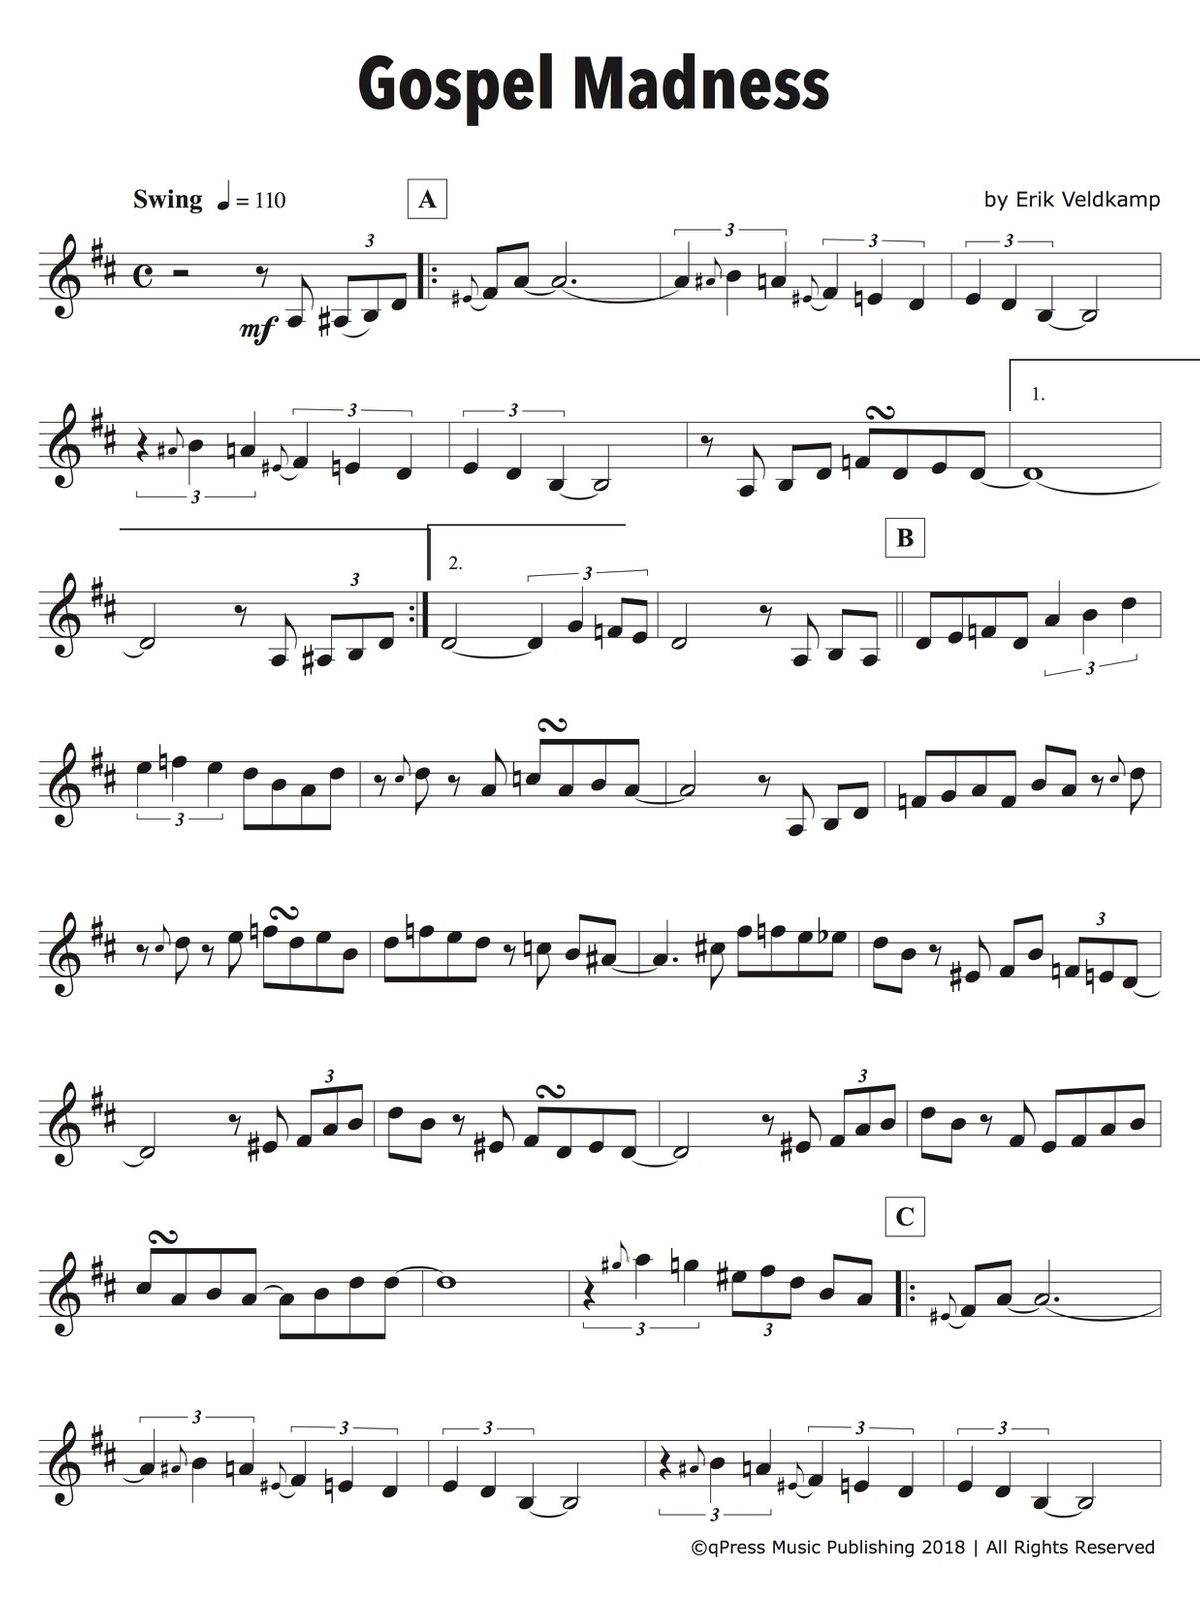 18 Play-Alongs in All Styles Level 4 (Intermediate)-p10